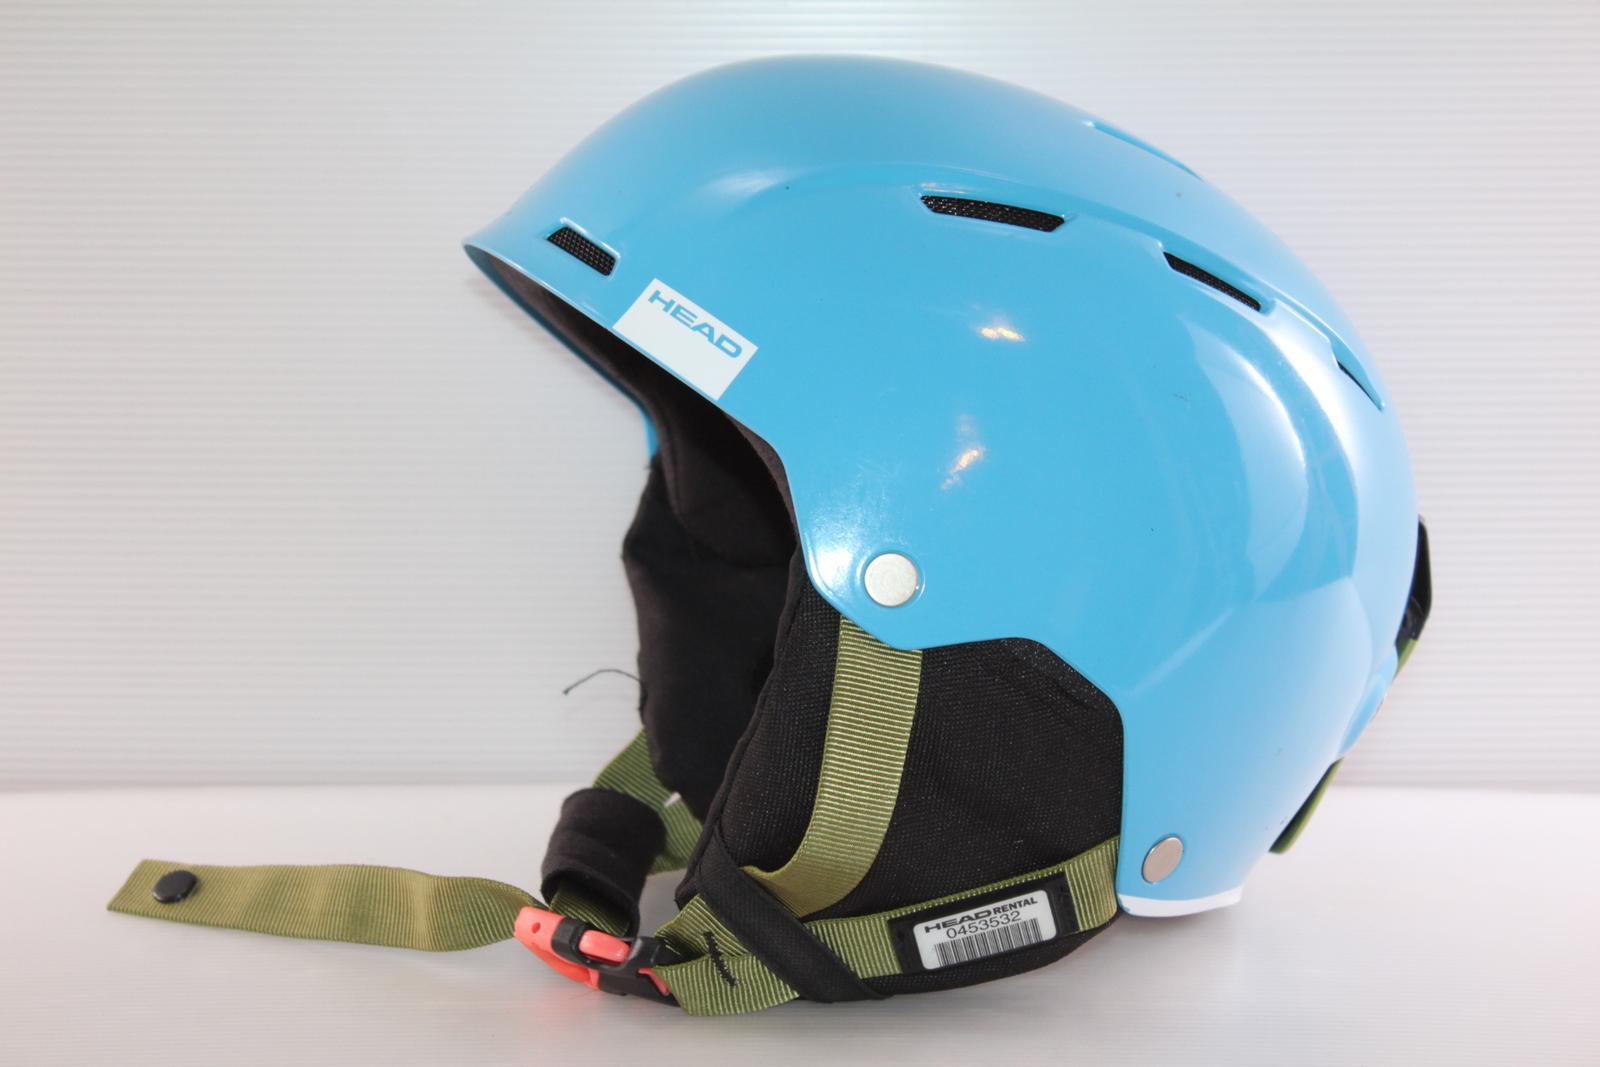 Dětská lyžařská helma Head Air Cyan - posuvná vel. 60 - 62